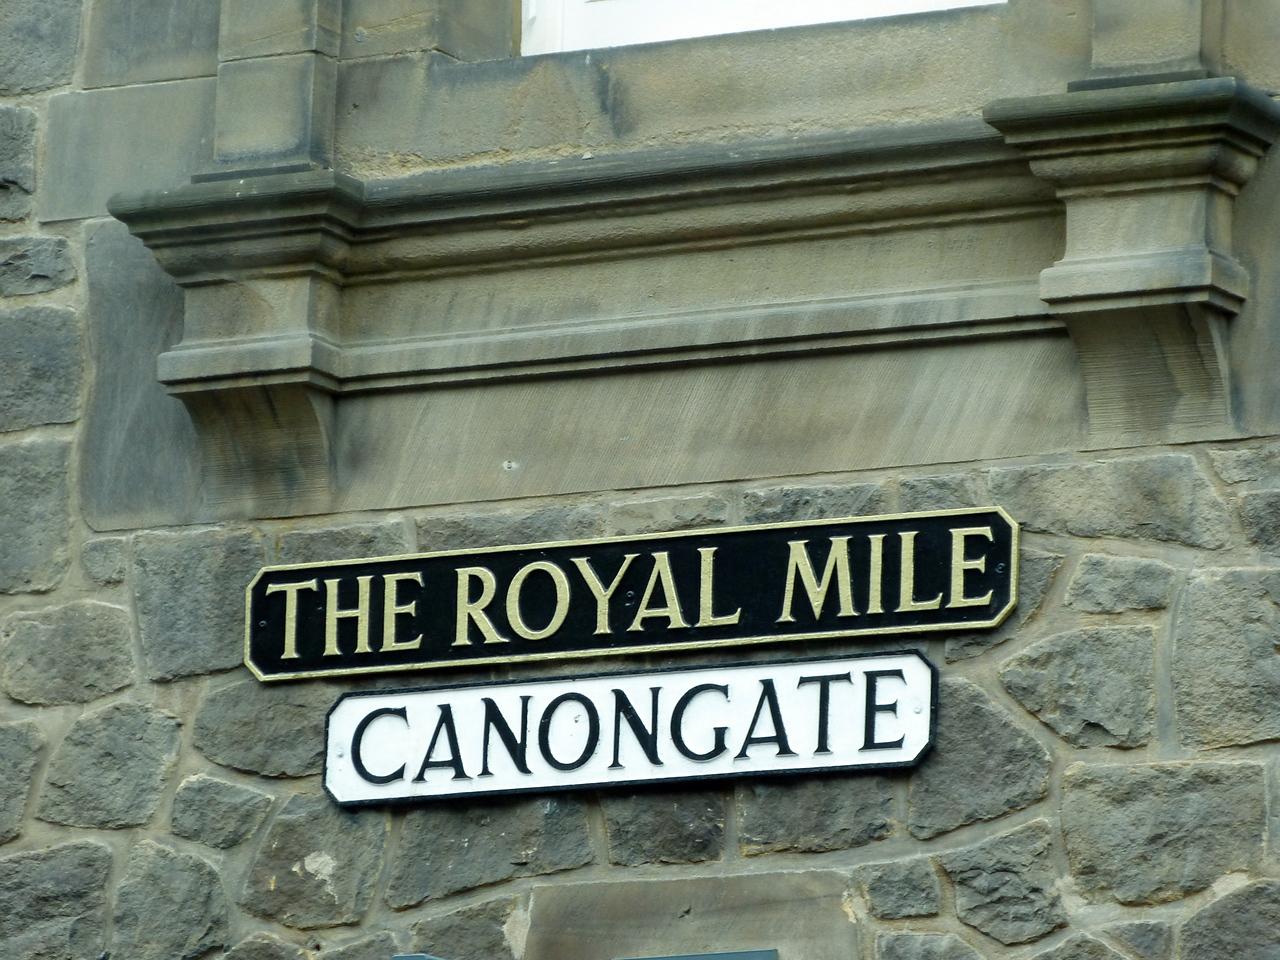 Canongate.